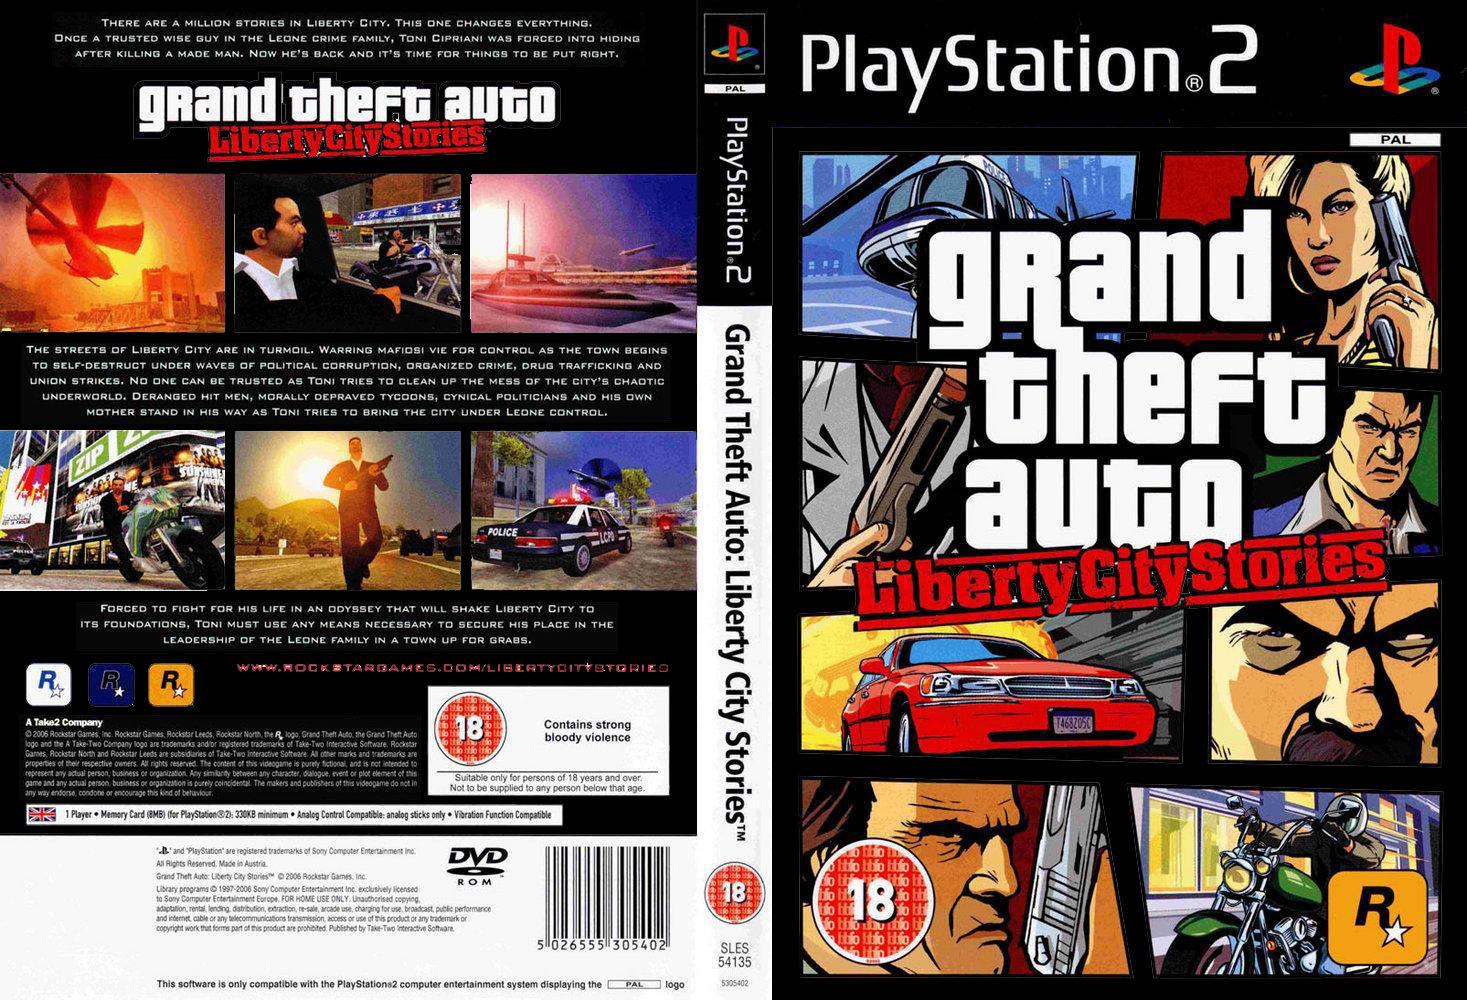 Grand Theft Auto Liberty City Stories 2006 PS2